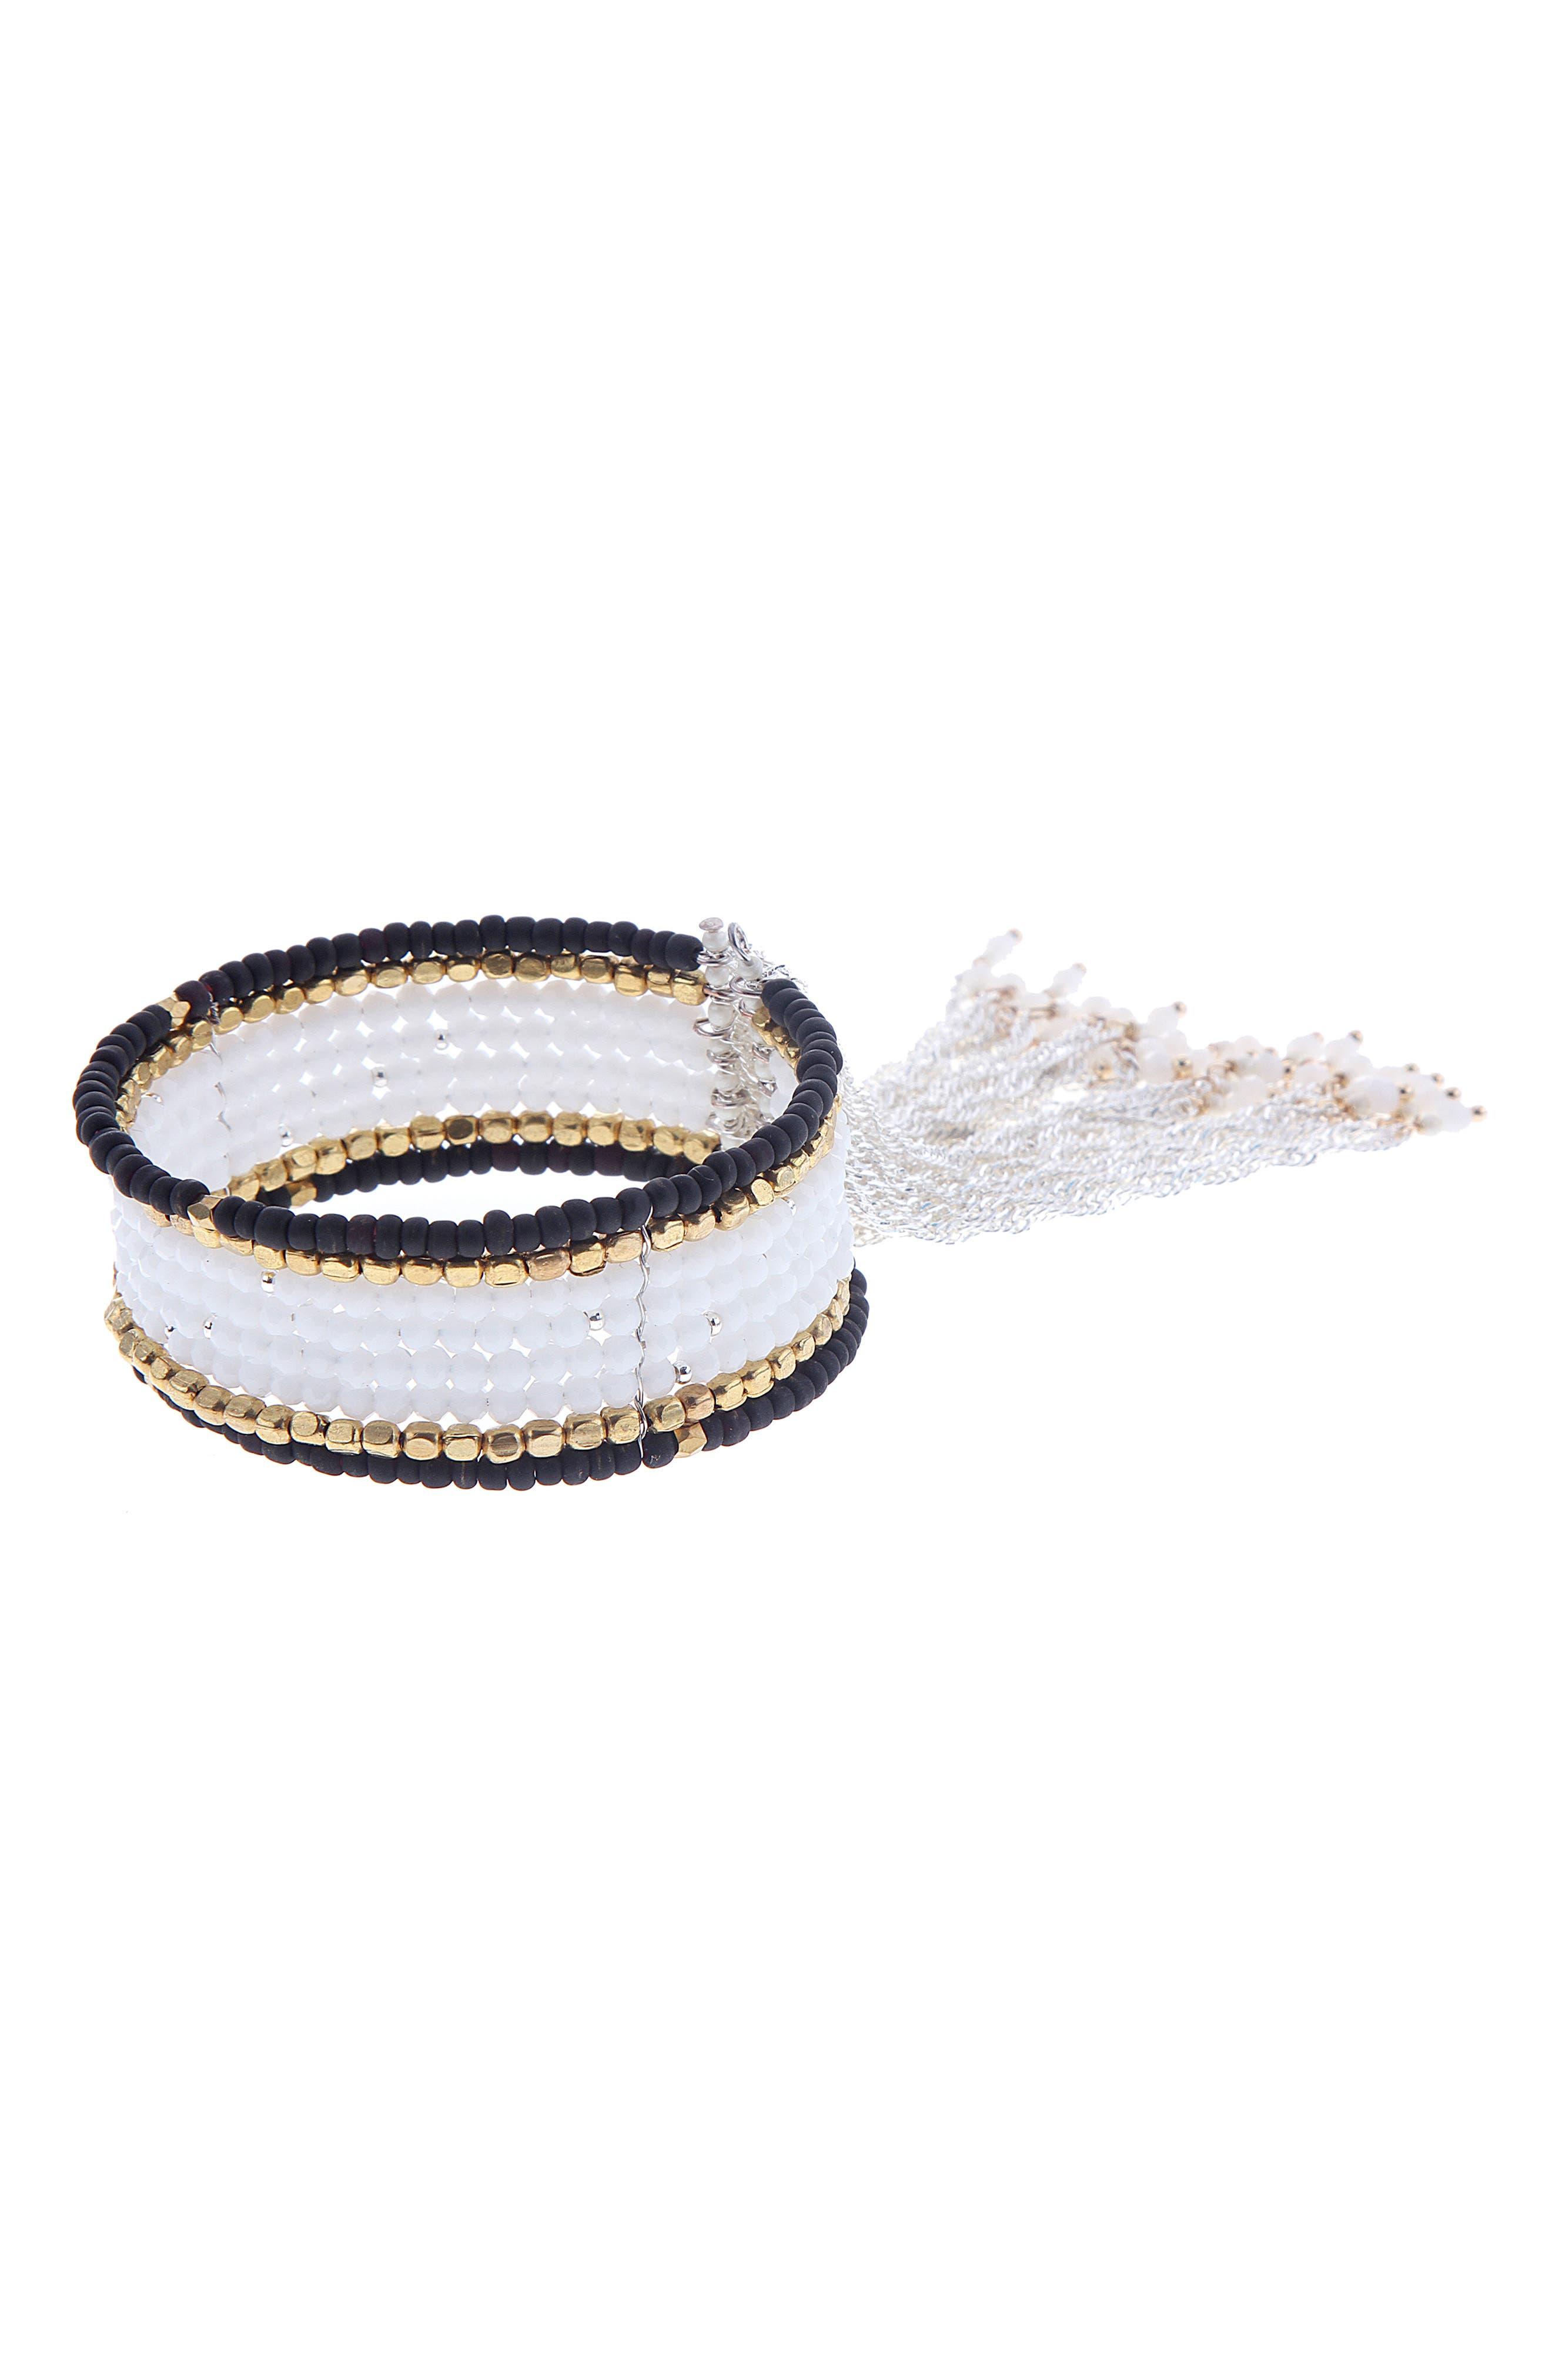 Beaded Chain Tassel Cuff Bracelet,                             Main thumbnail 1, color,                             White/ Black